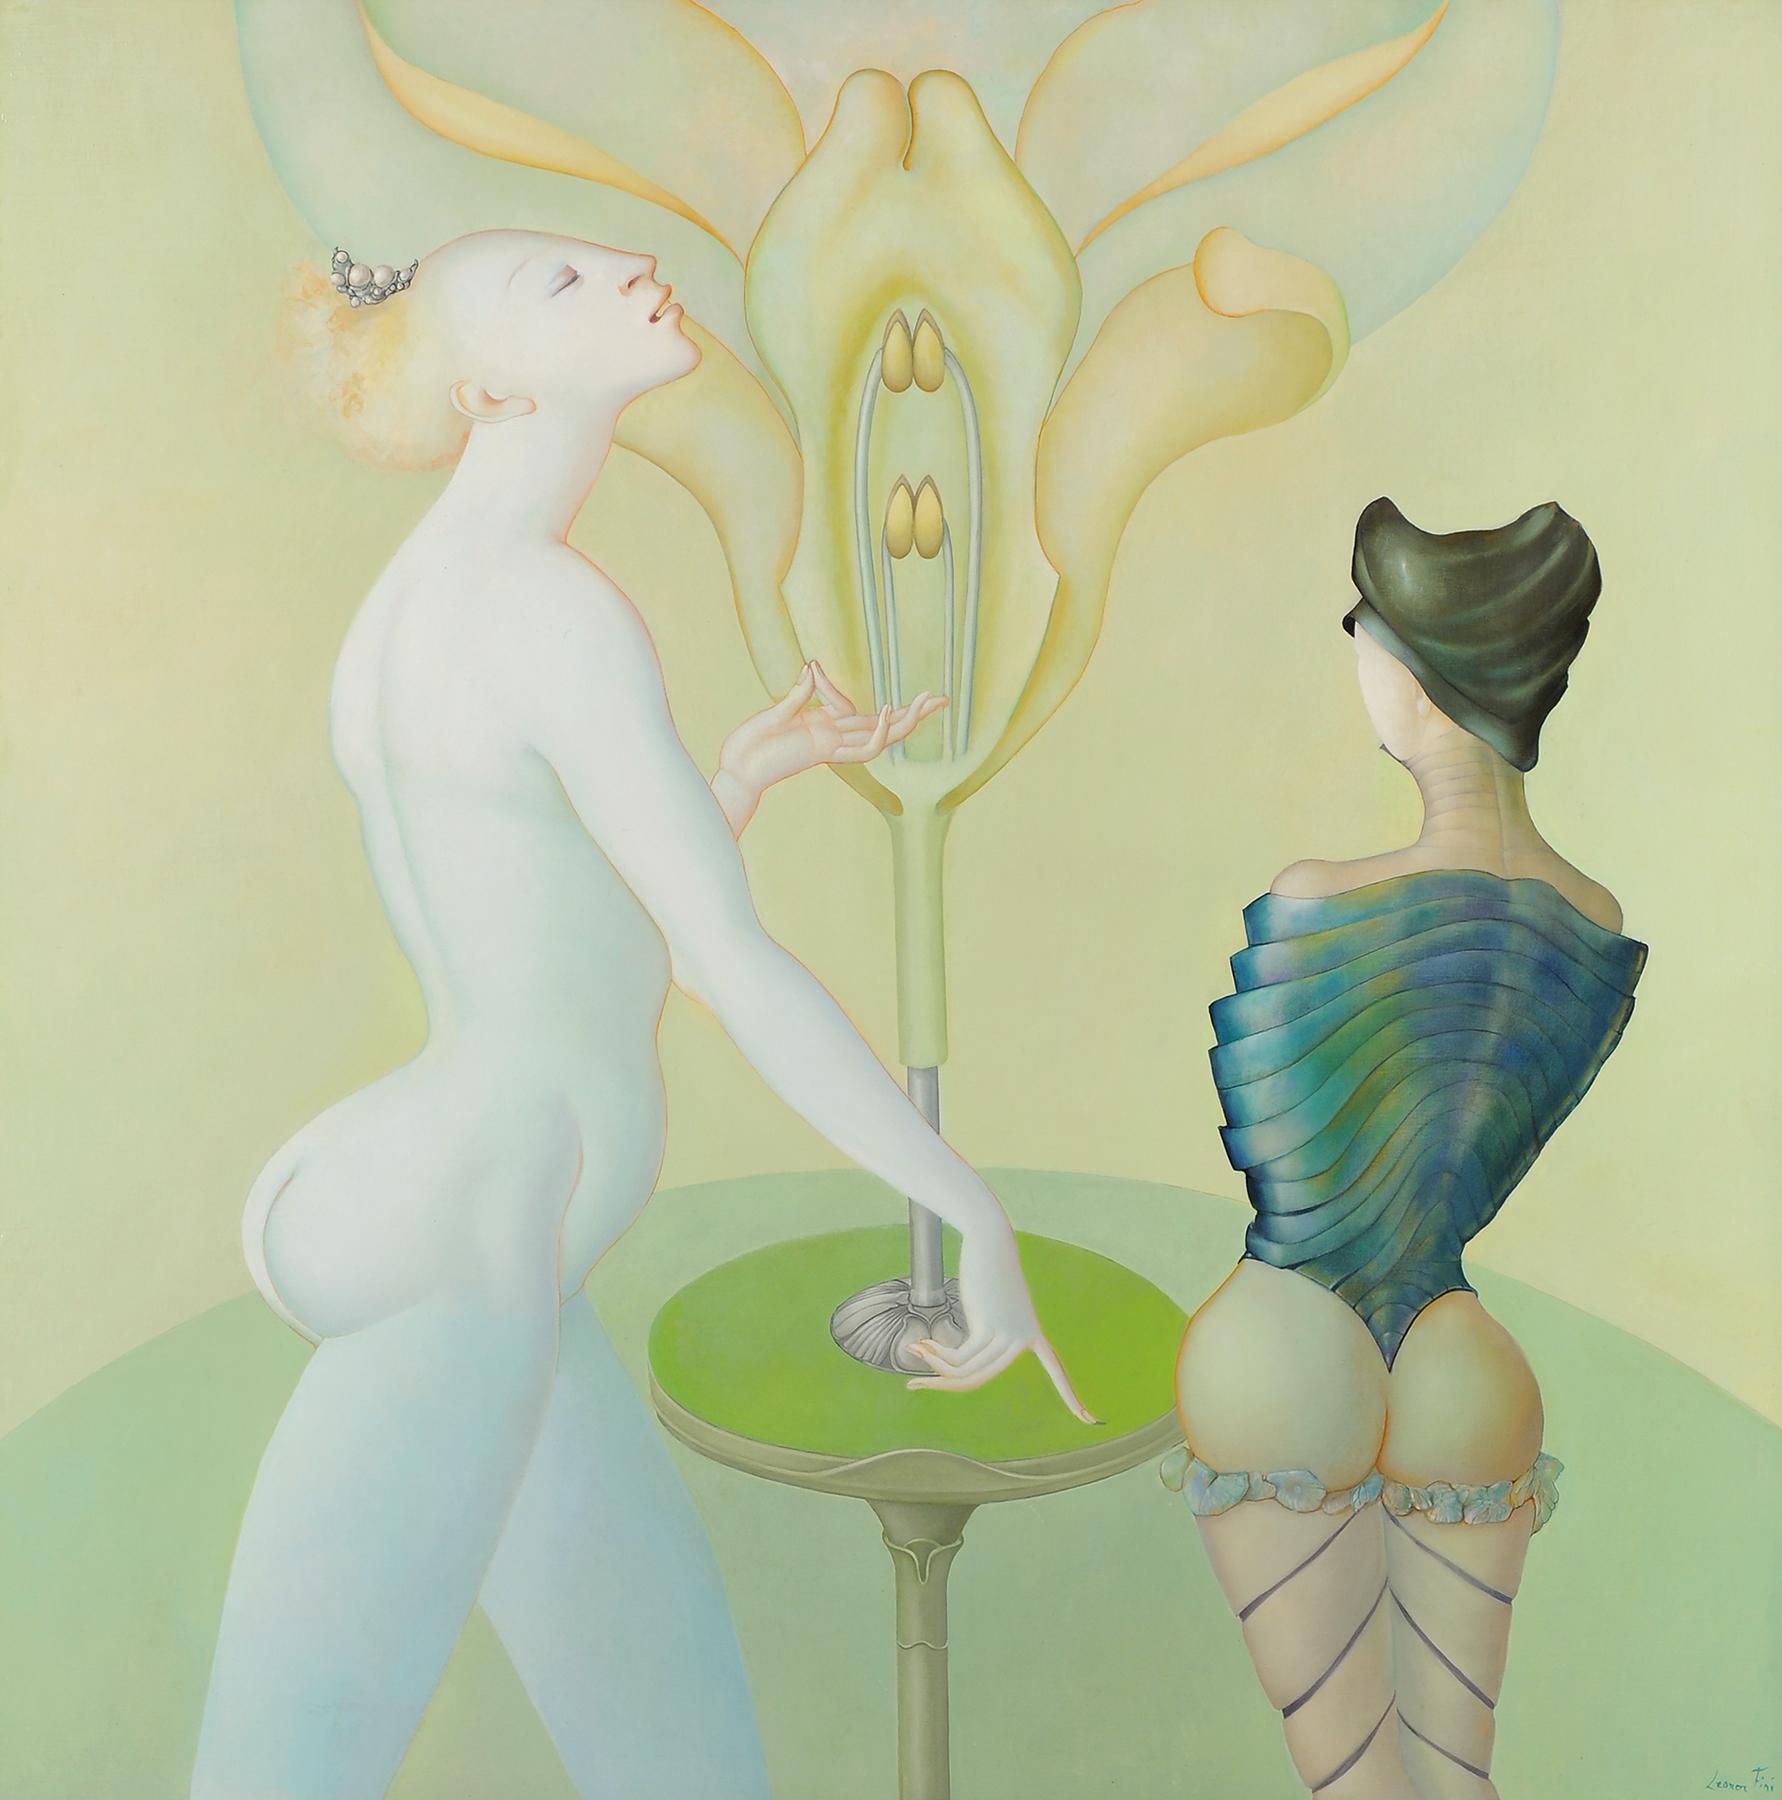 The Botany Lesson (La Leçon de botanique), 1974, Oil on canvas  Courtesy of Weinstein Gallery, San Francisco